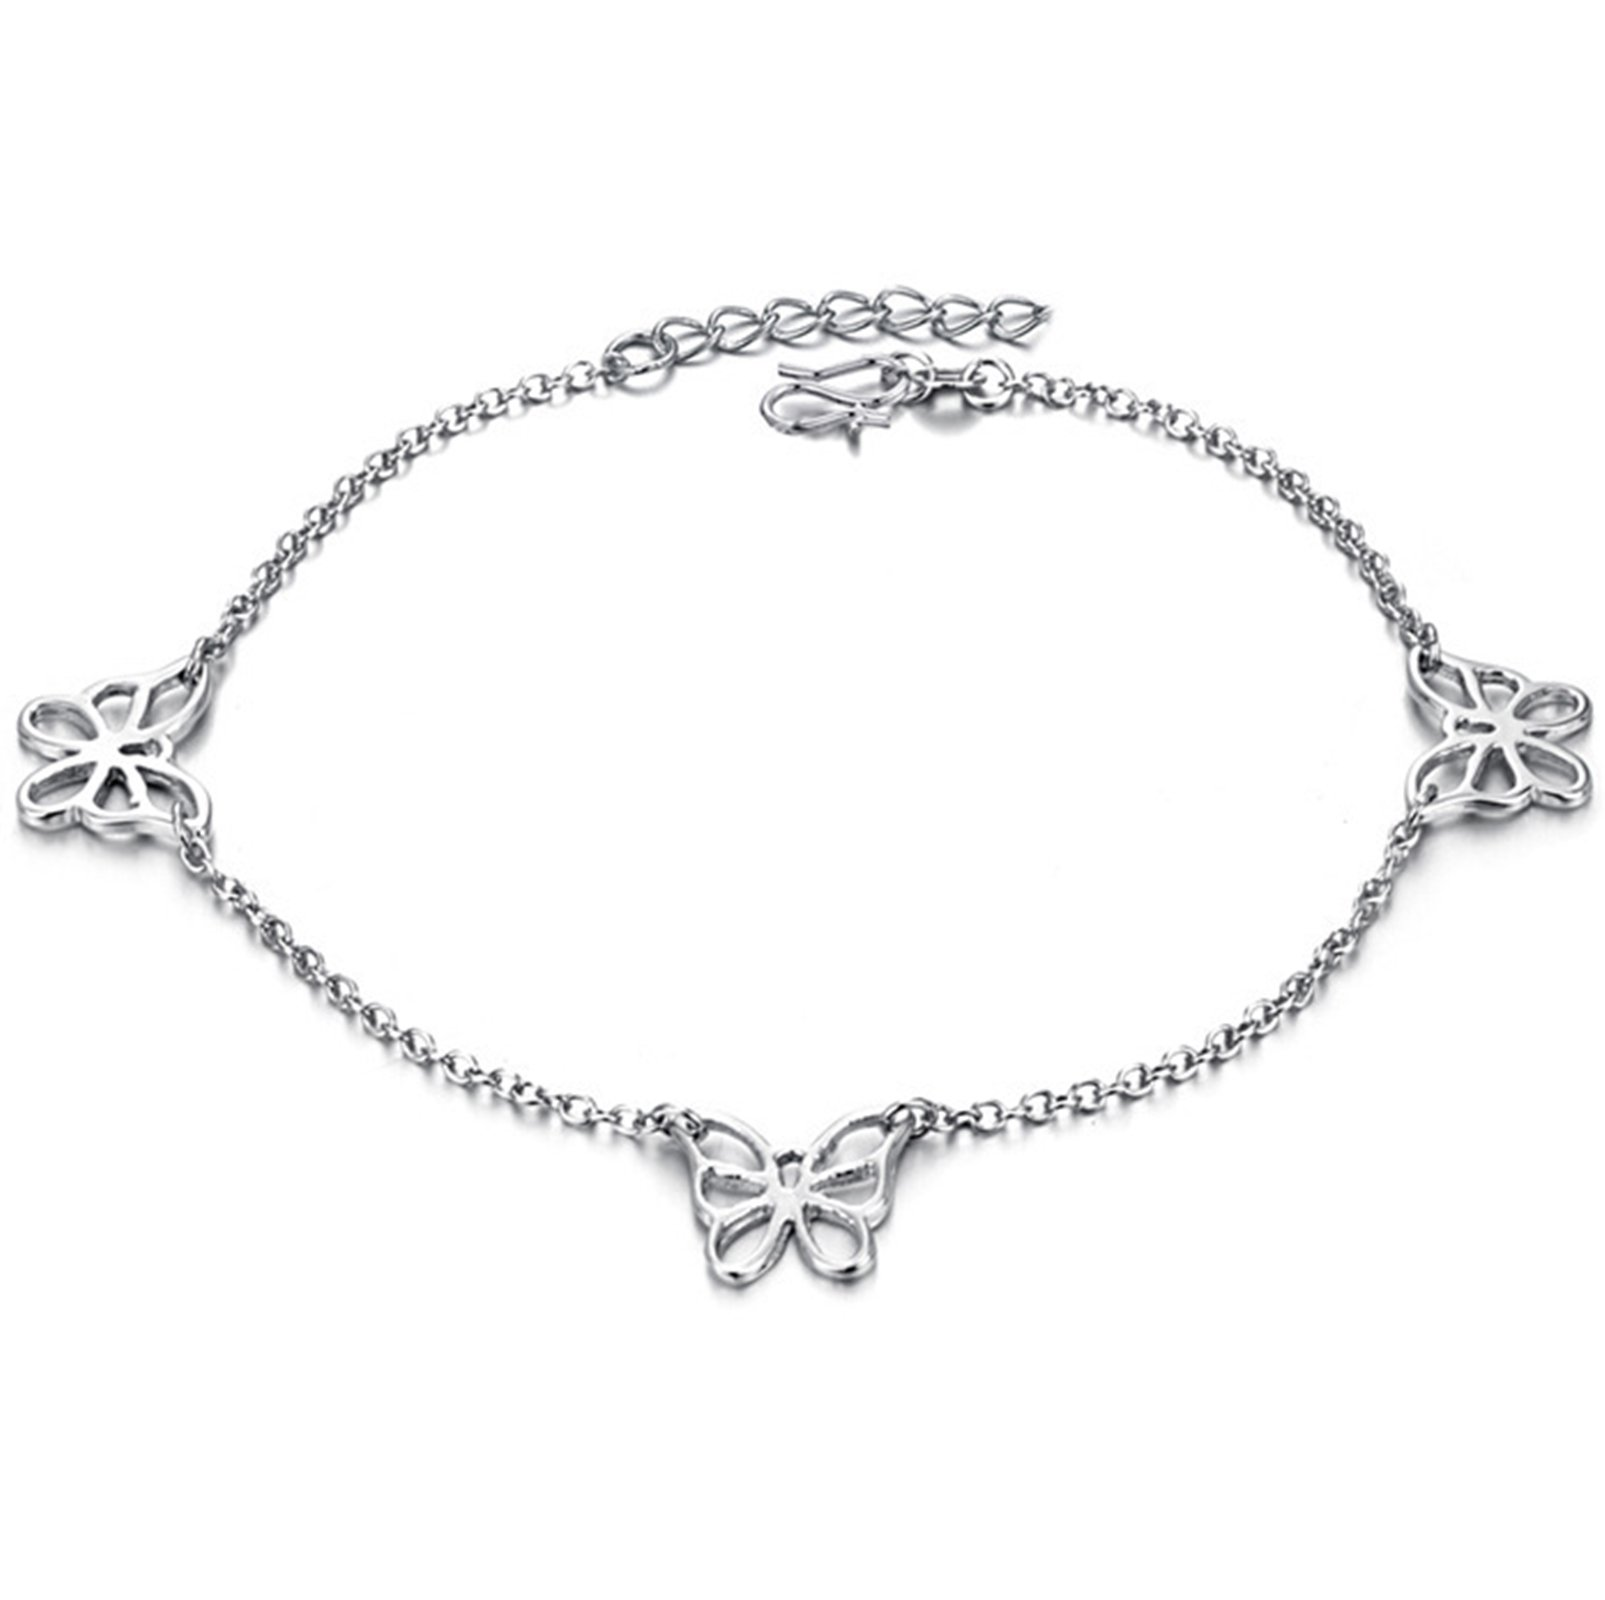 Beydodo Silver Ankle Bracelet Adjustable Bohemian Anklet Summer Gold Plated Butterfly Anklet